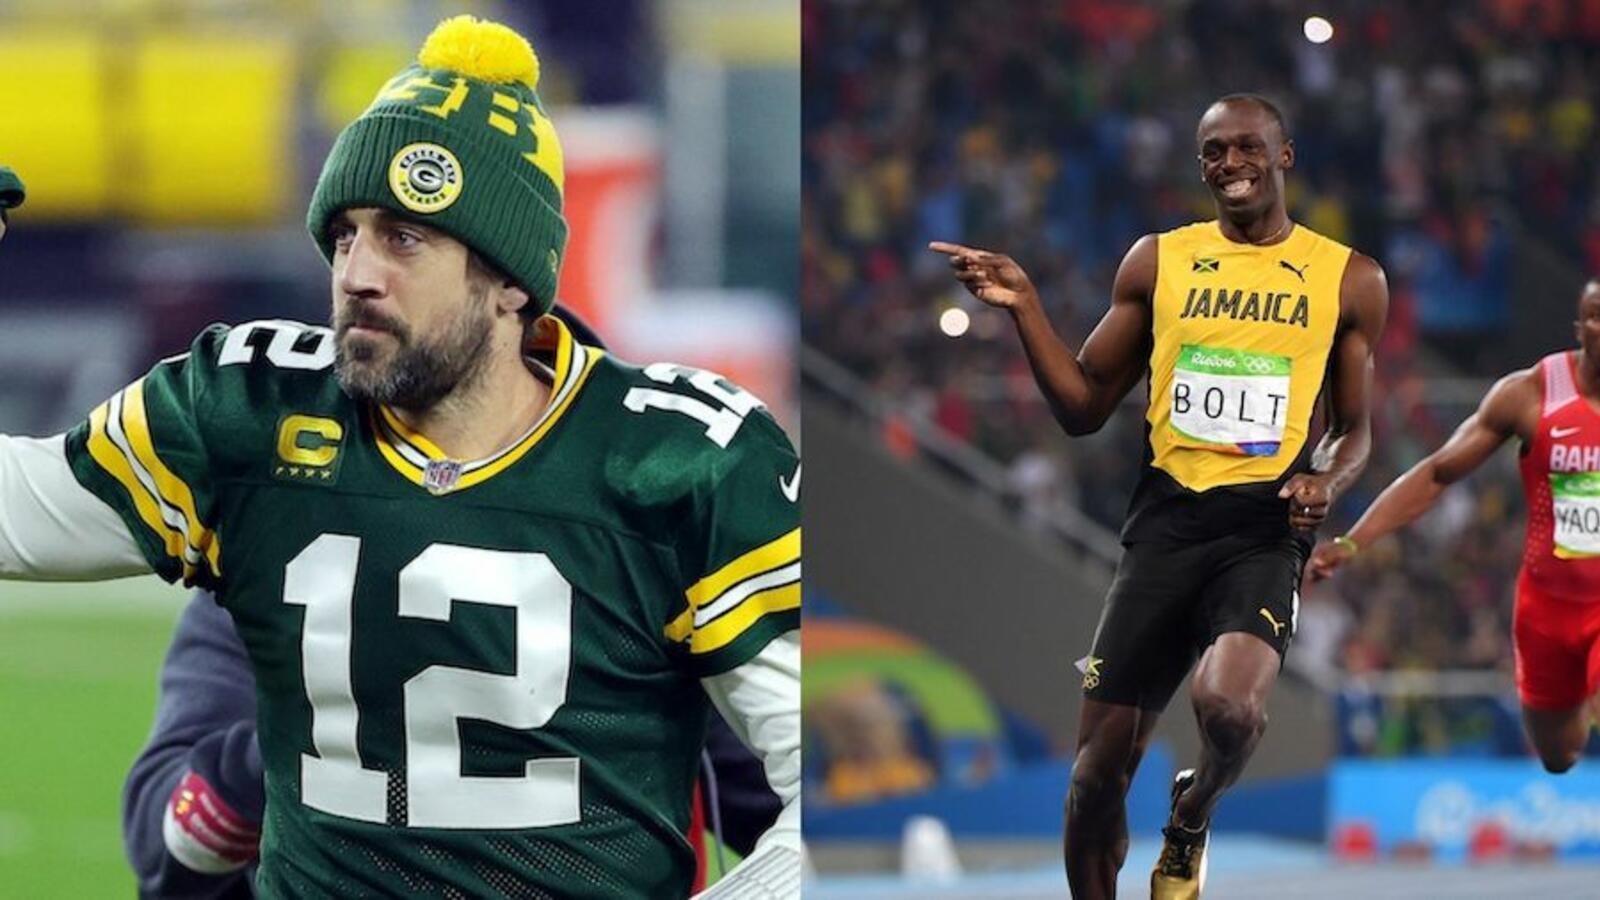 WATCH: Usain Bolt Explains Packers Fandom, Responds To Rodgers' Return